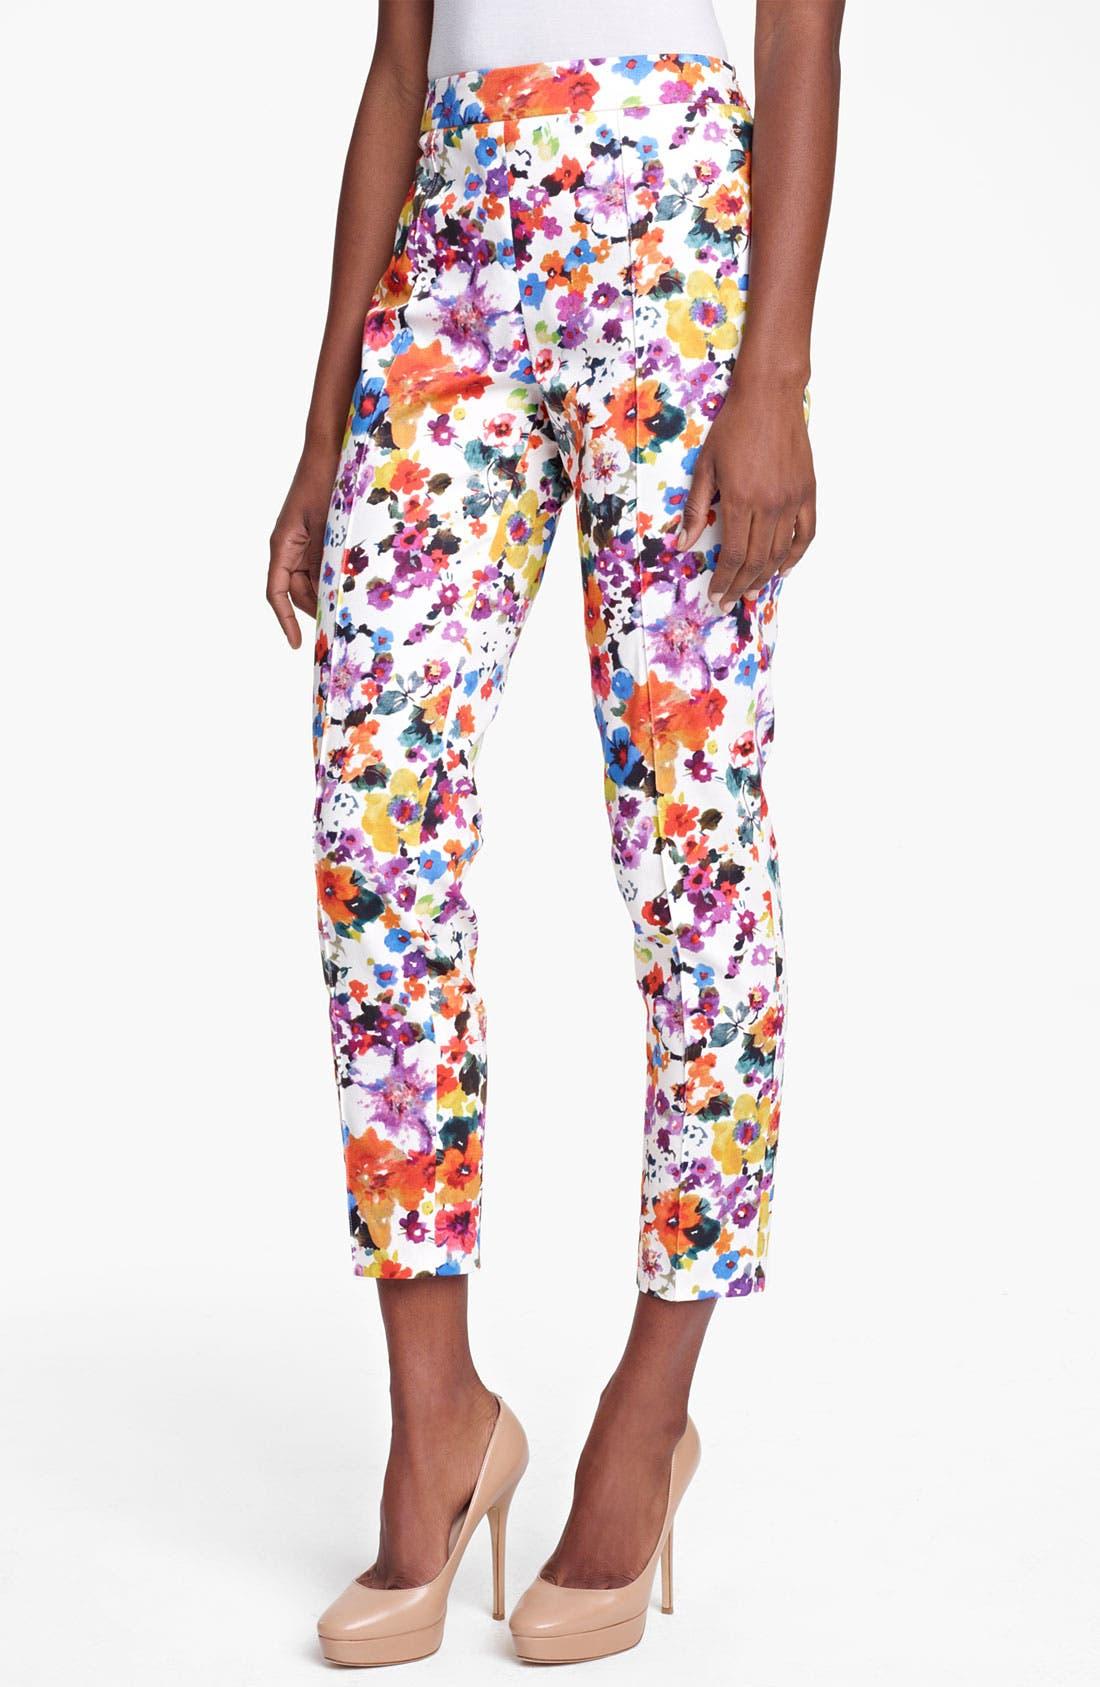 Main Image - Max Mara 'Friscia' Floral Print Stretch Cotton Crop Pants